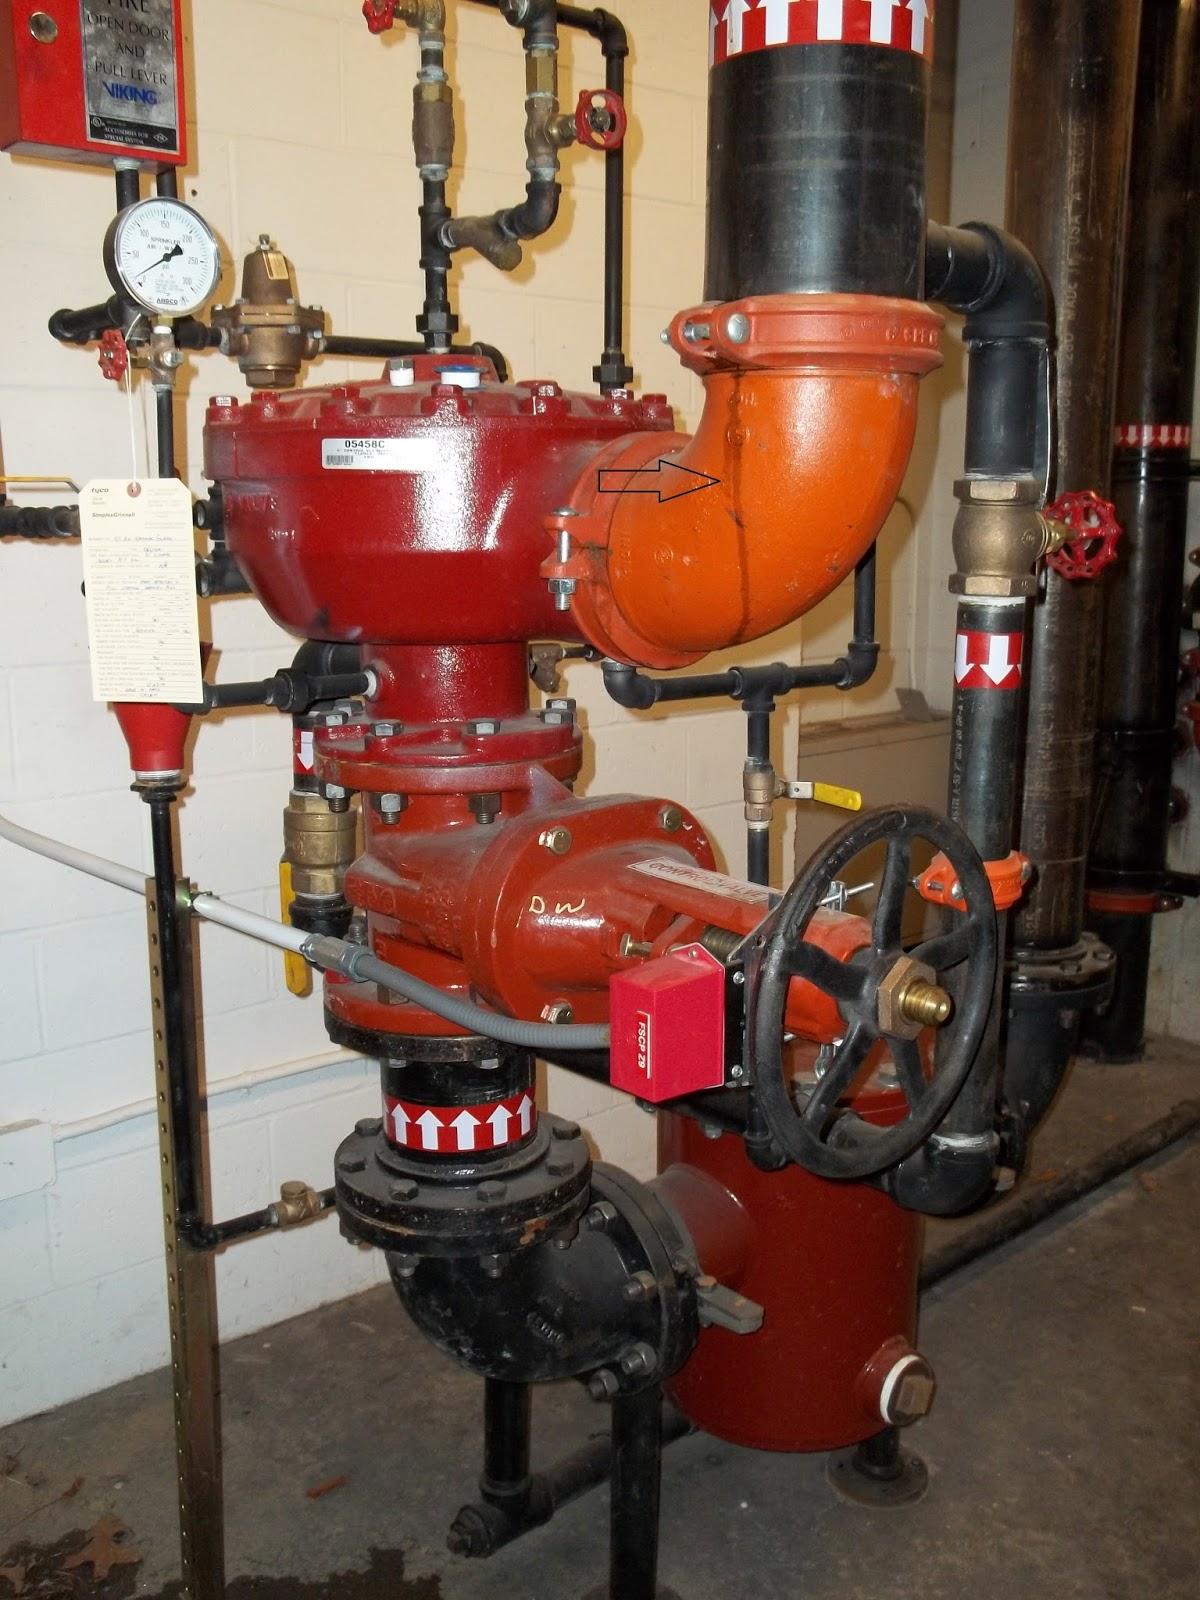 Fire Protection Deficiencies: Leaks